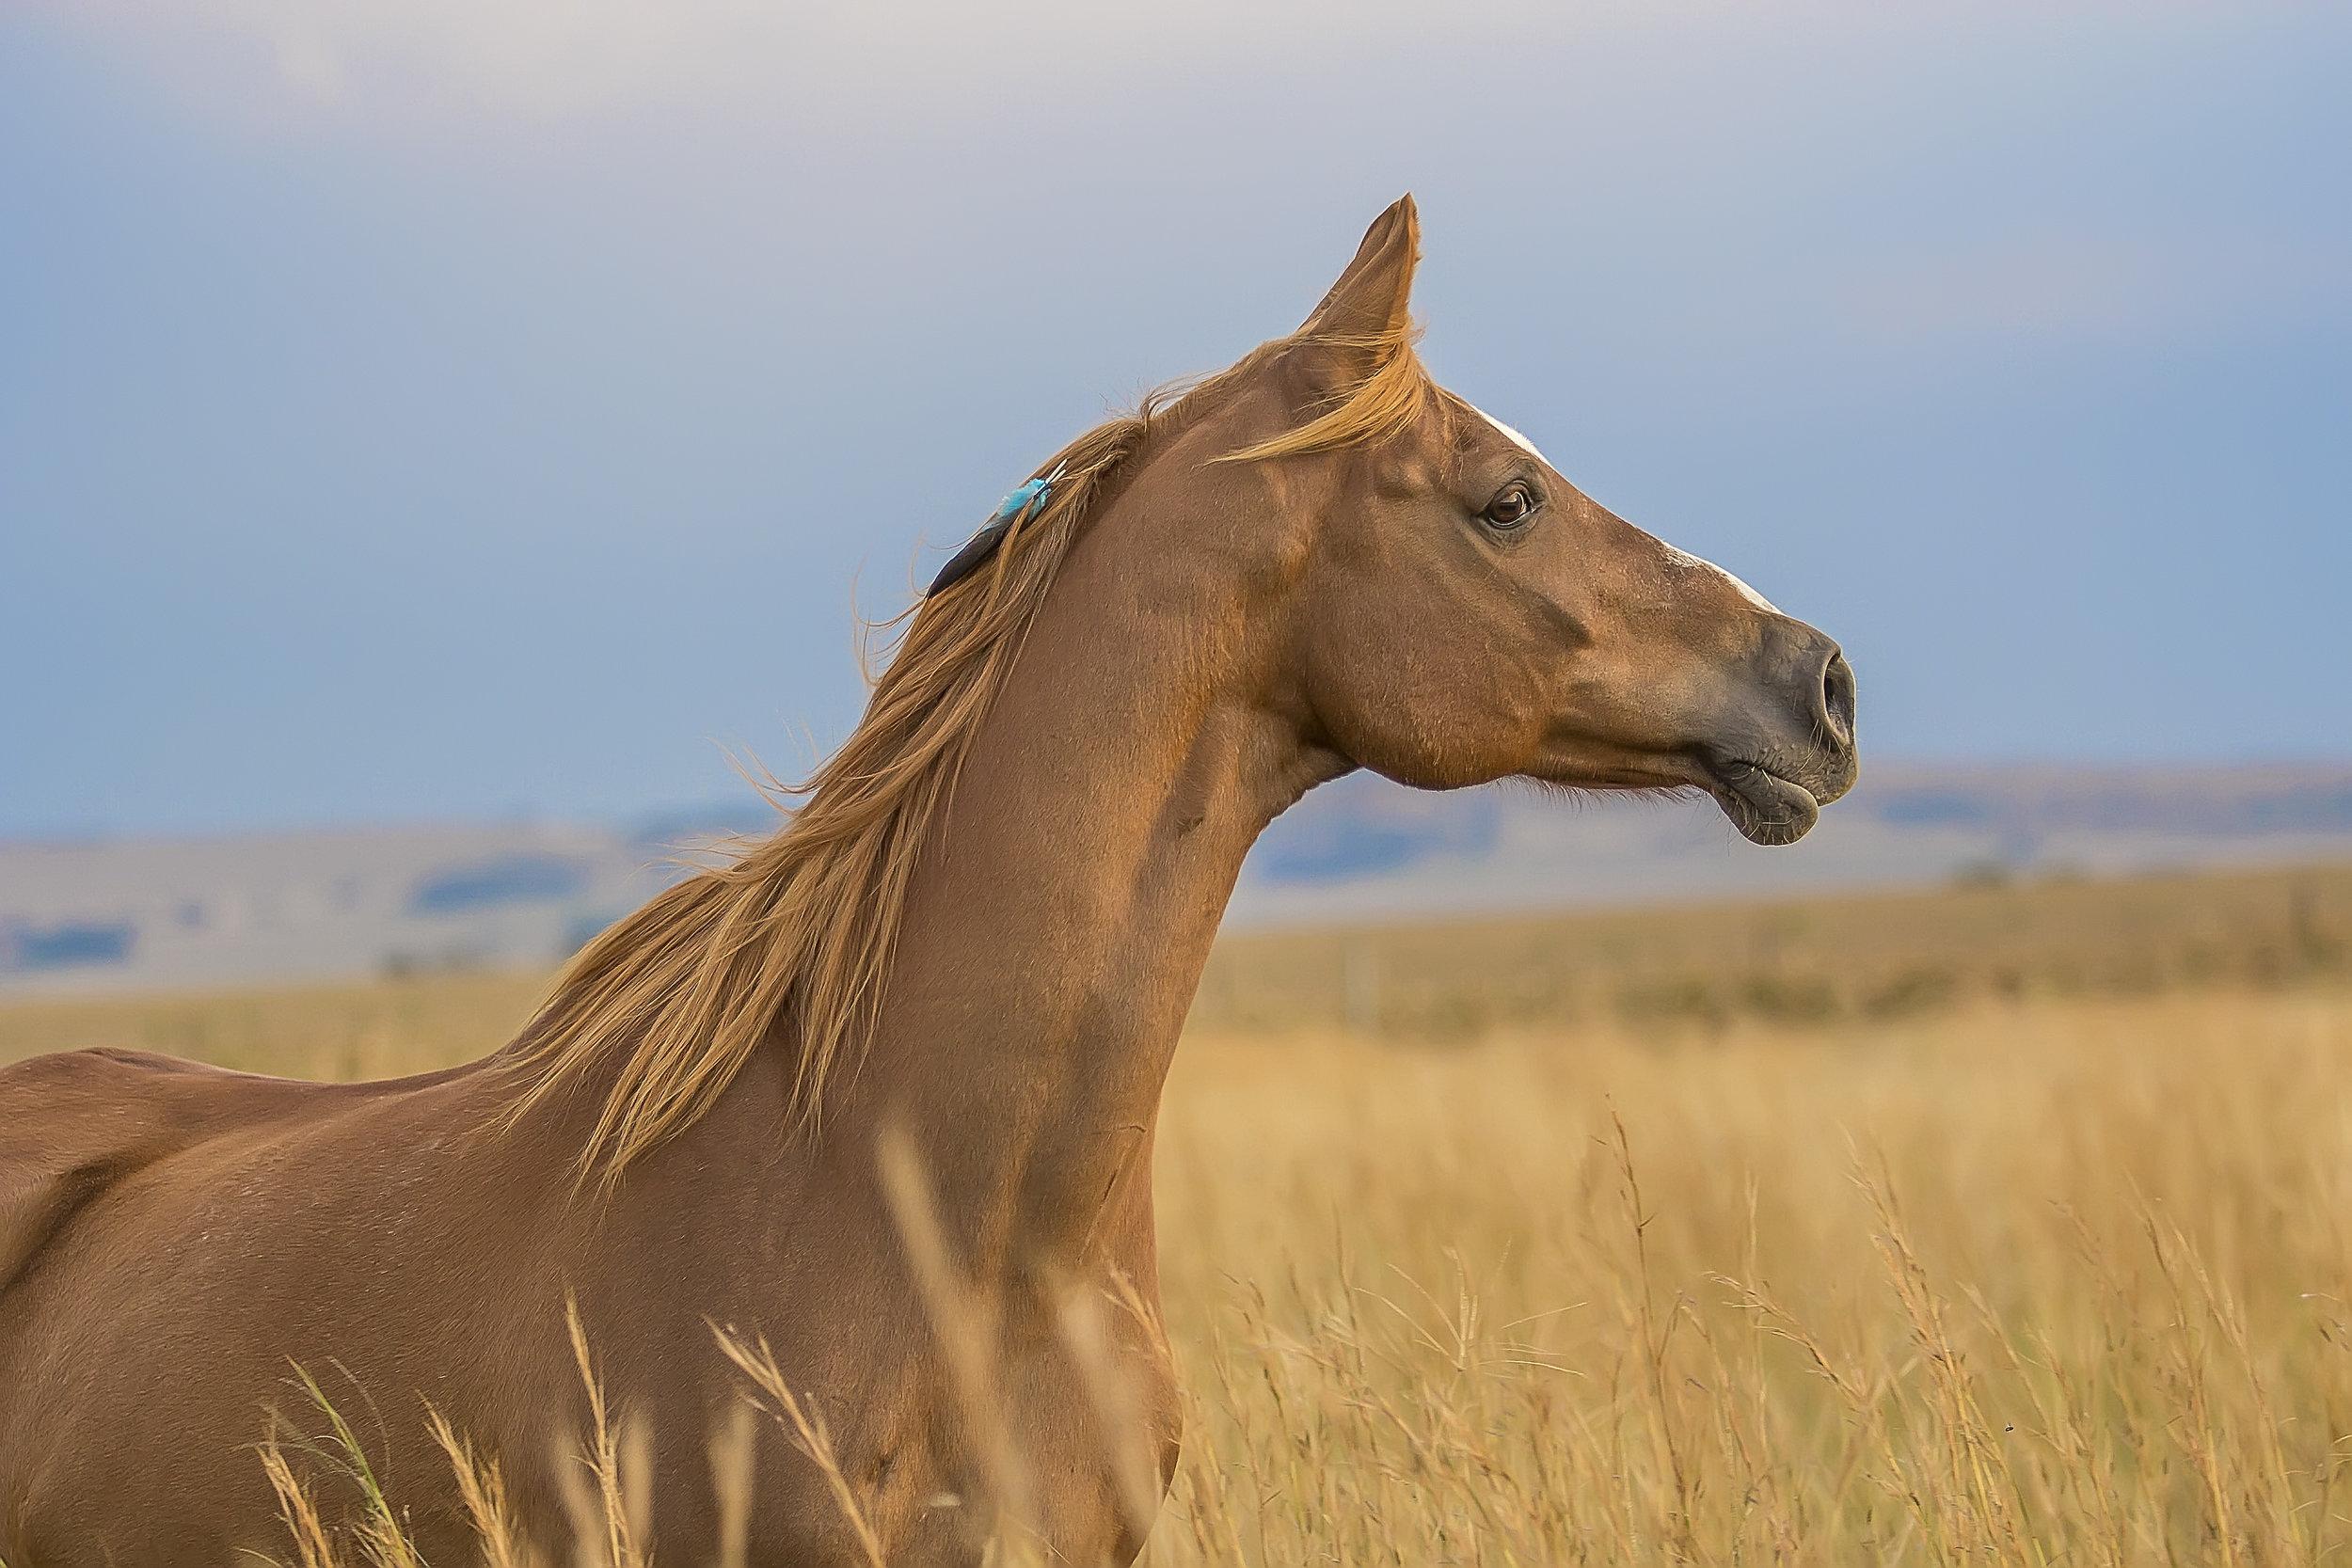 Horse looking away